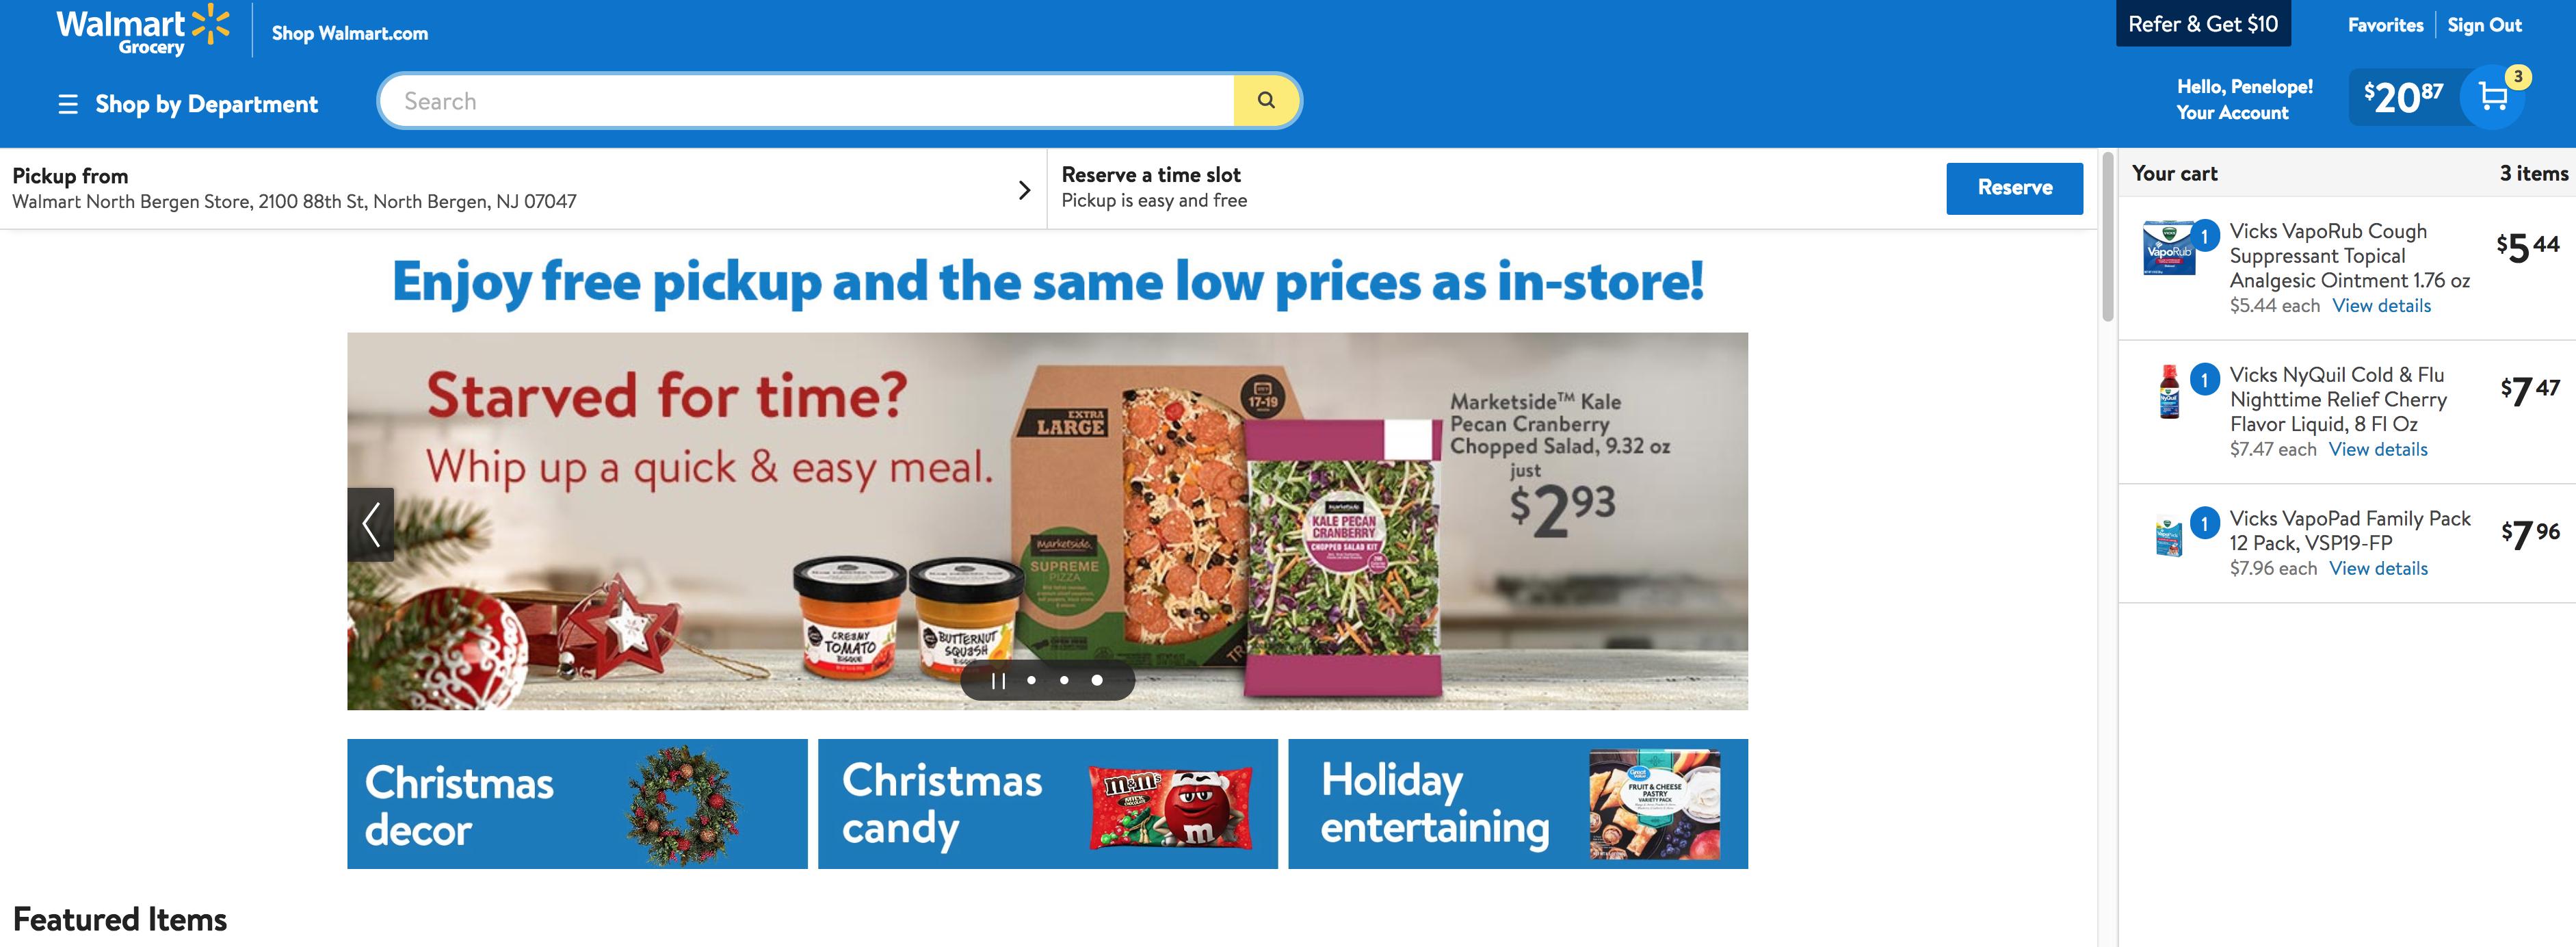 Walmart Frocery Pickup